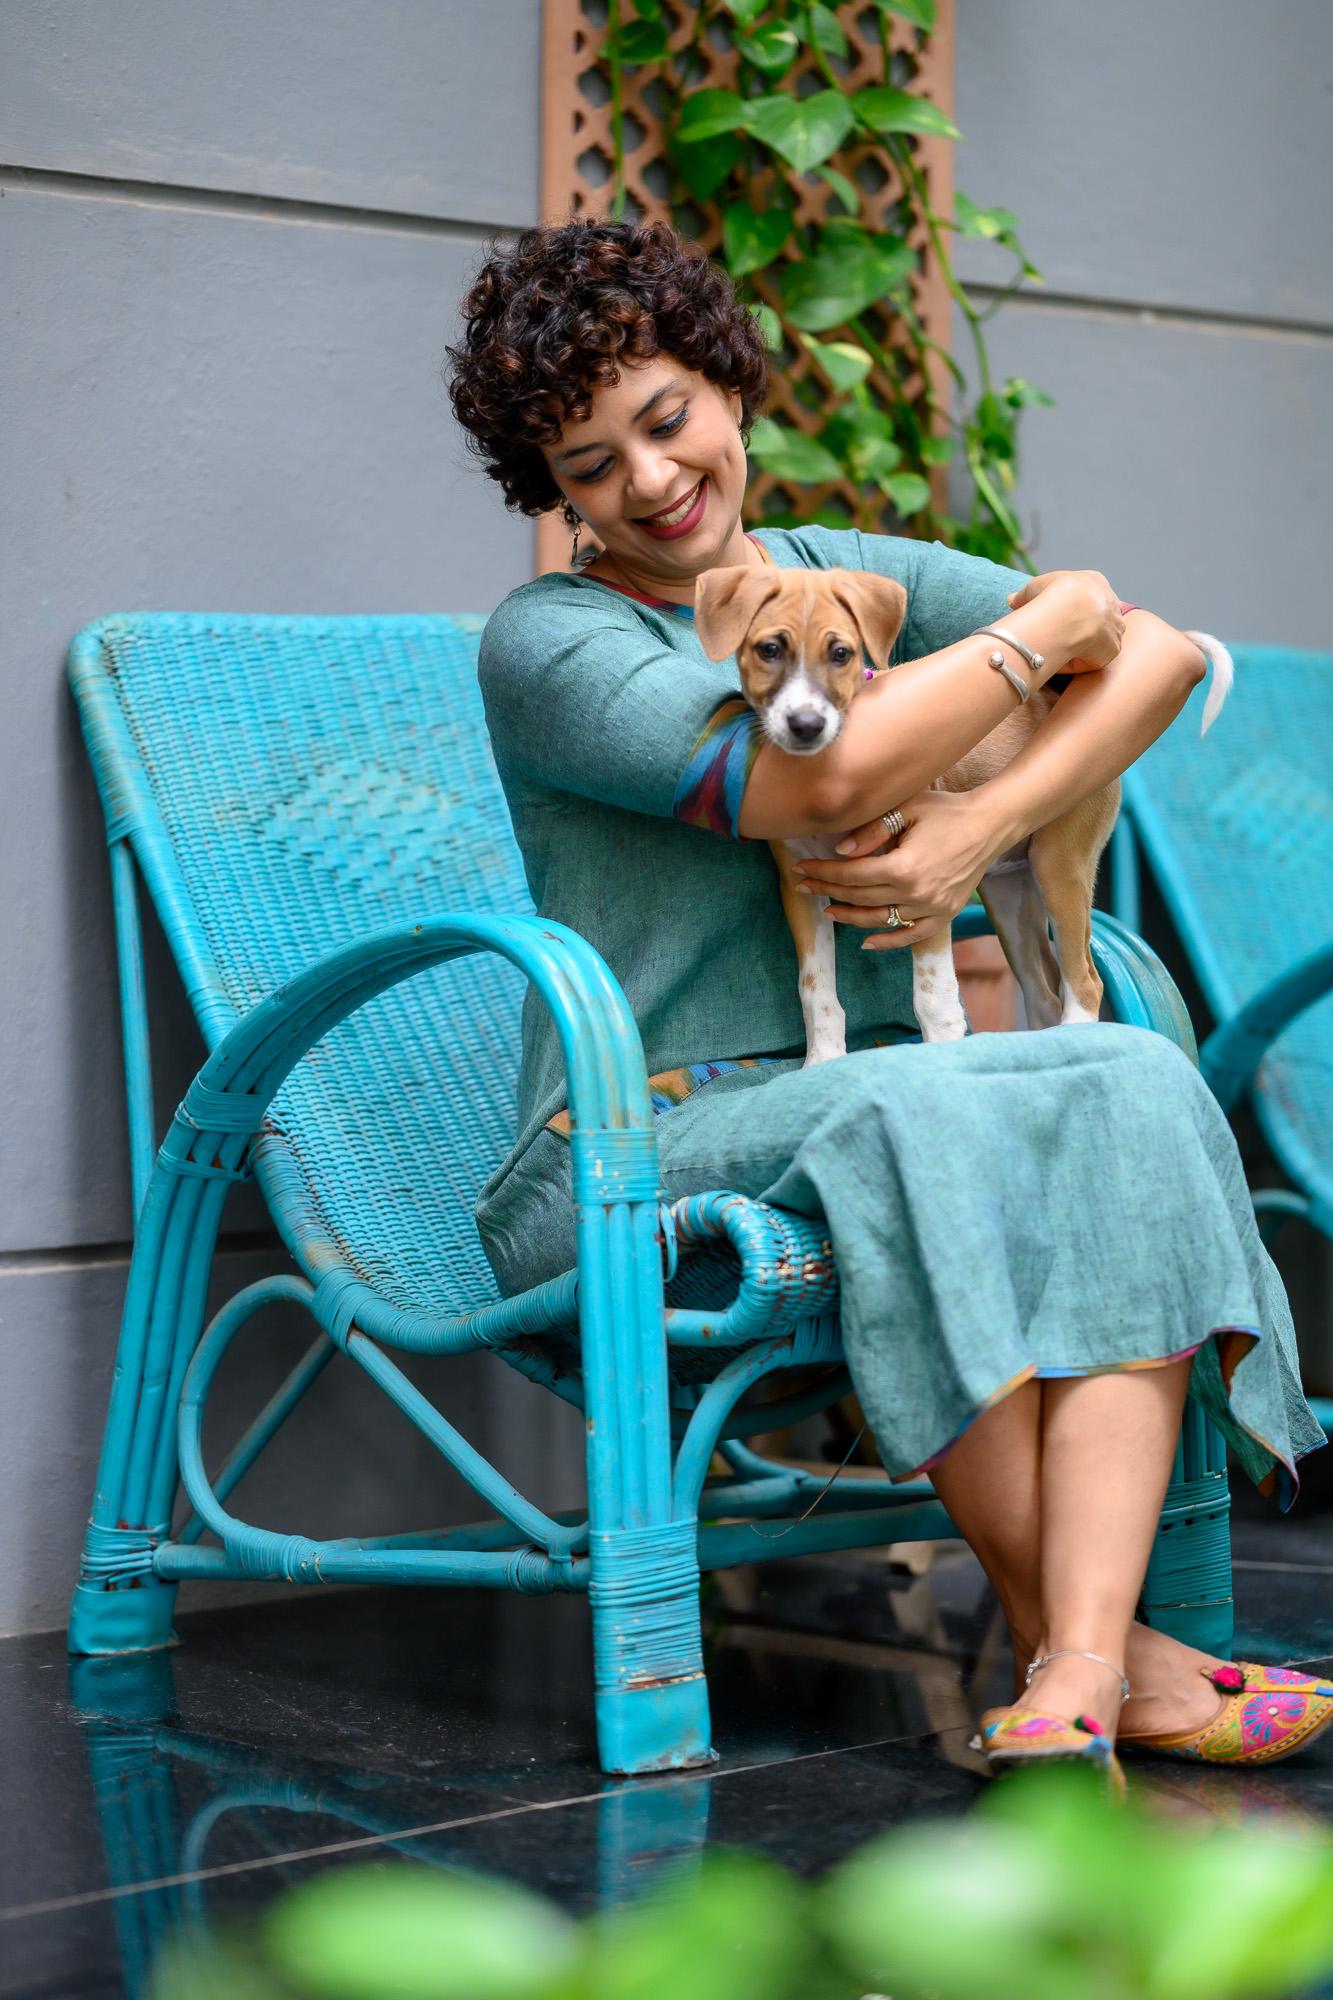 Neeta-Shankar-Photography-Lifestyle-Portrait-Photographer-casual-portraits-of-founder-ceo-AMARKOSA-sustainable-fashion-brand